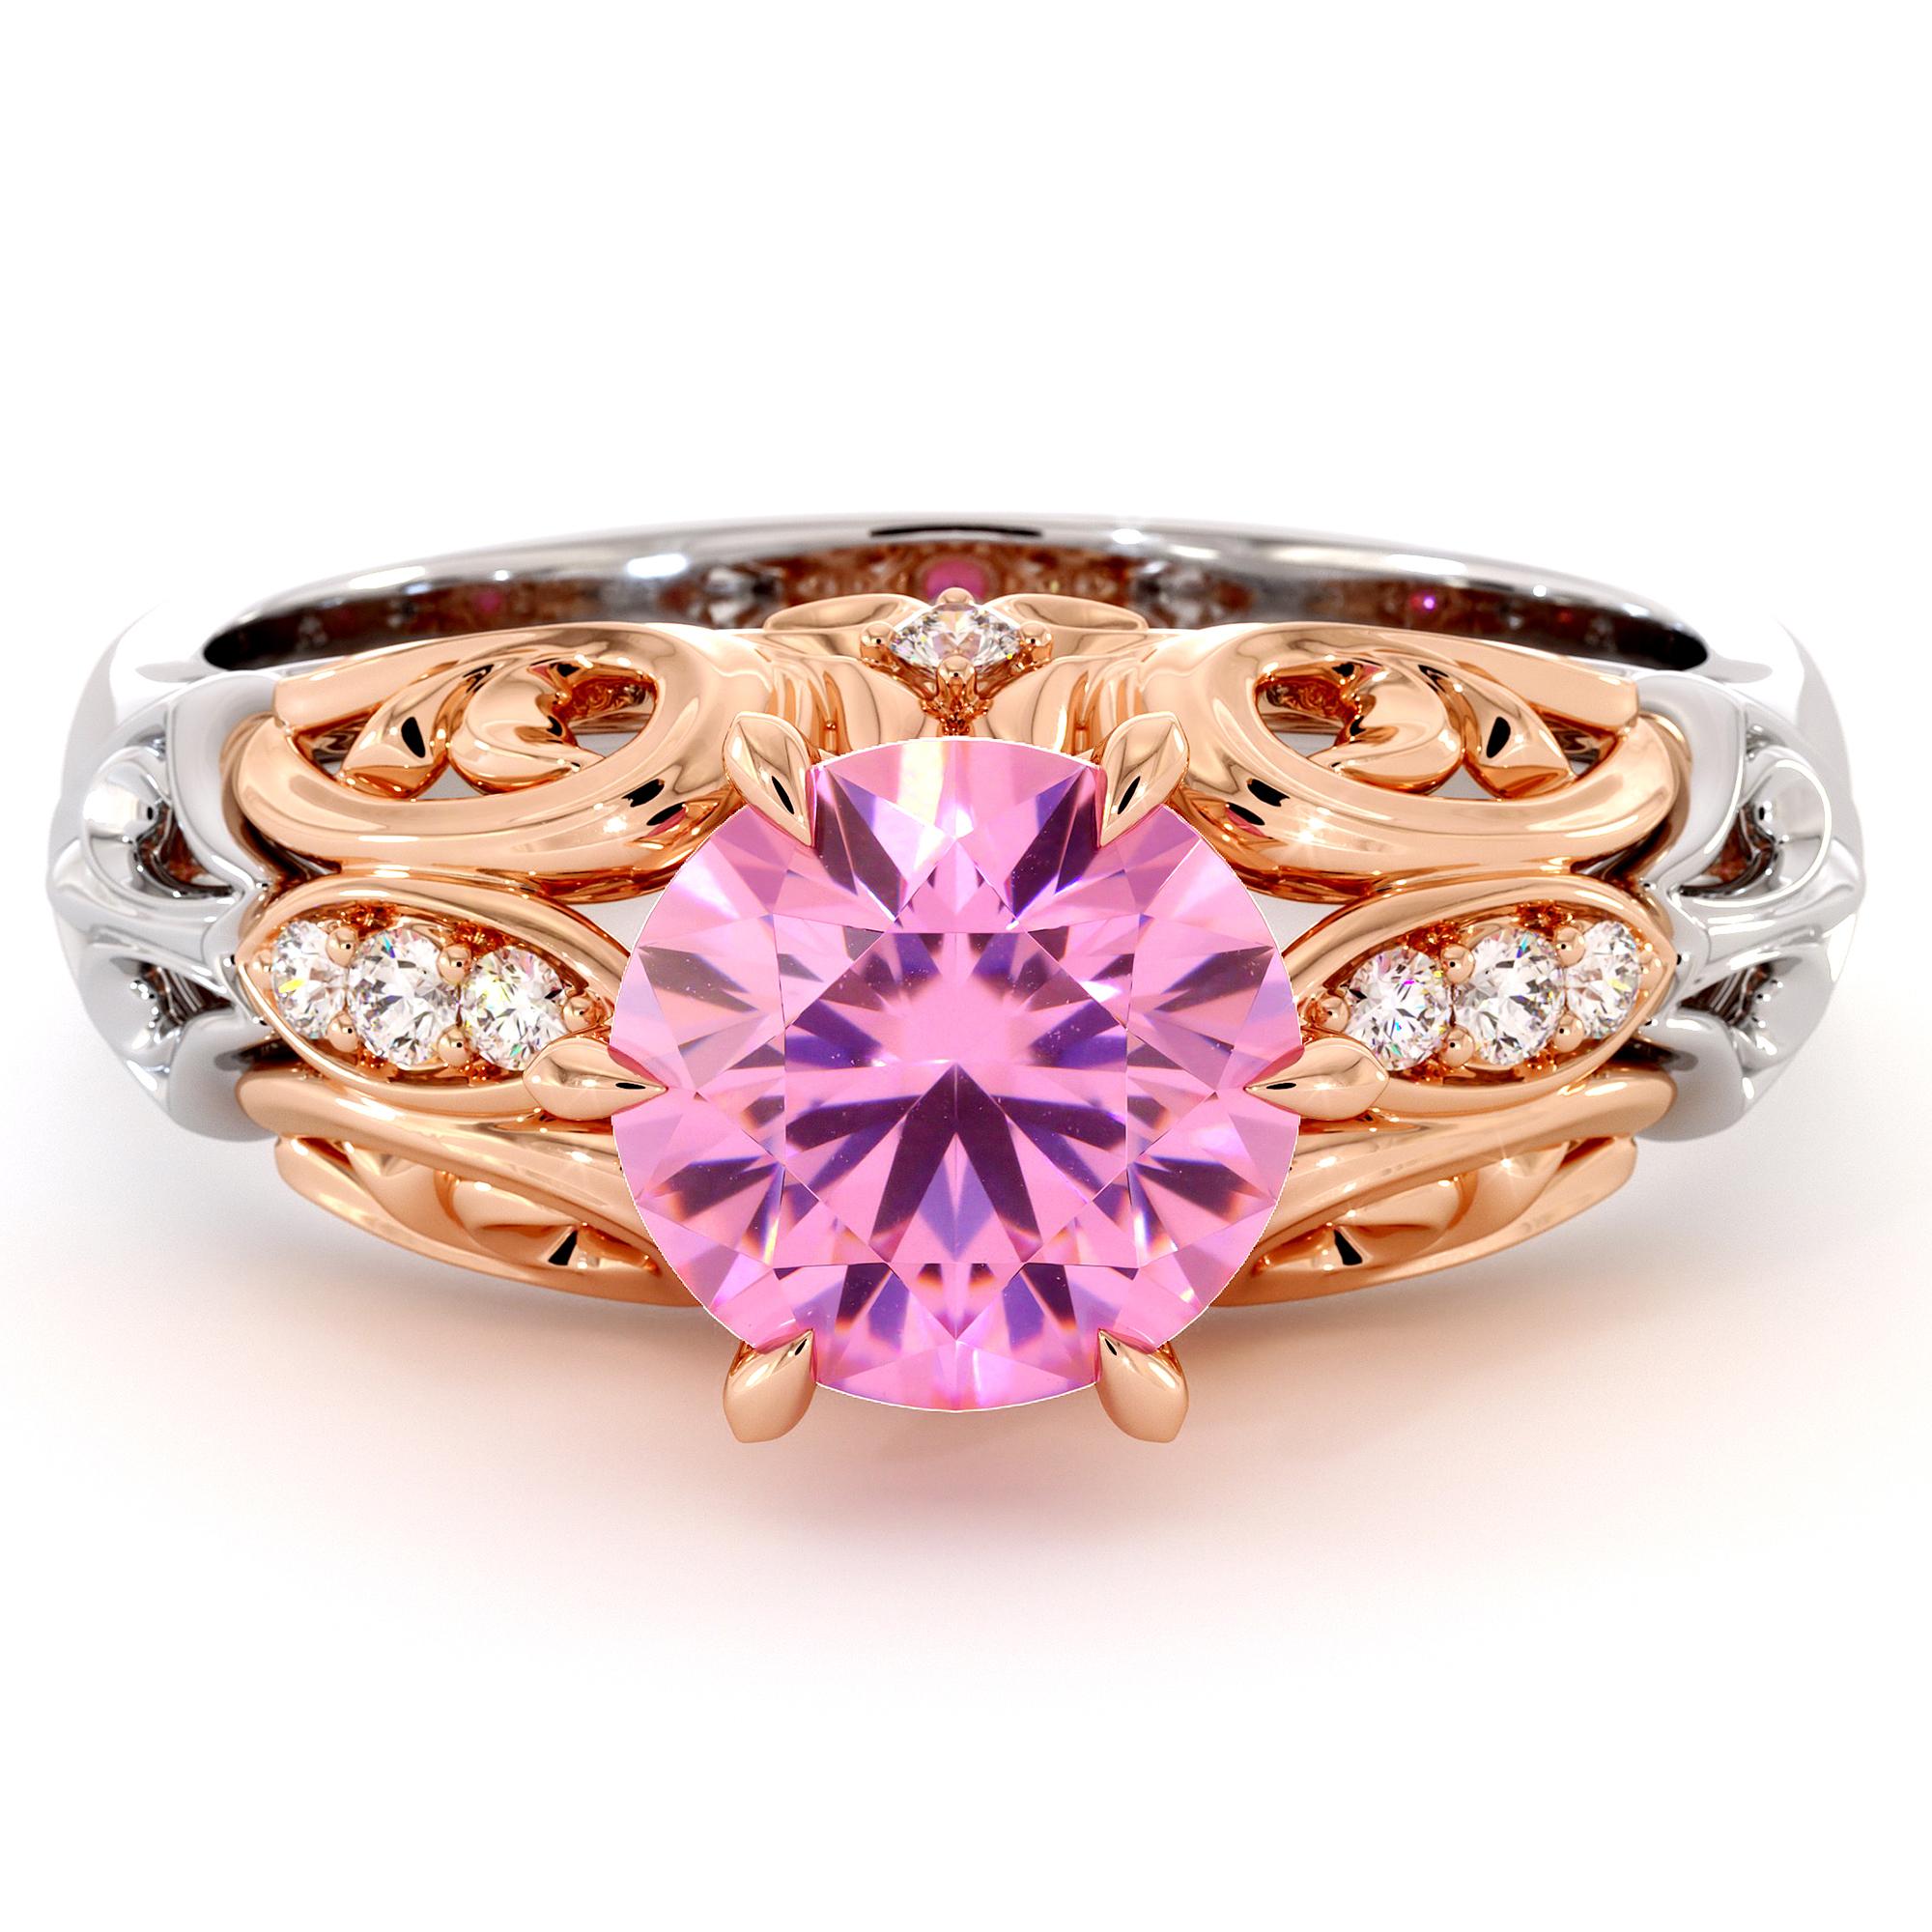 Royal Filigree 2 Ct Pink Sapphire engagement ring